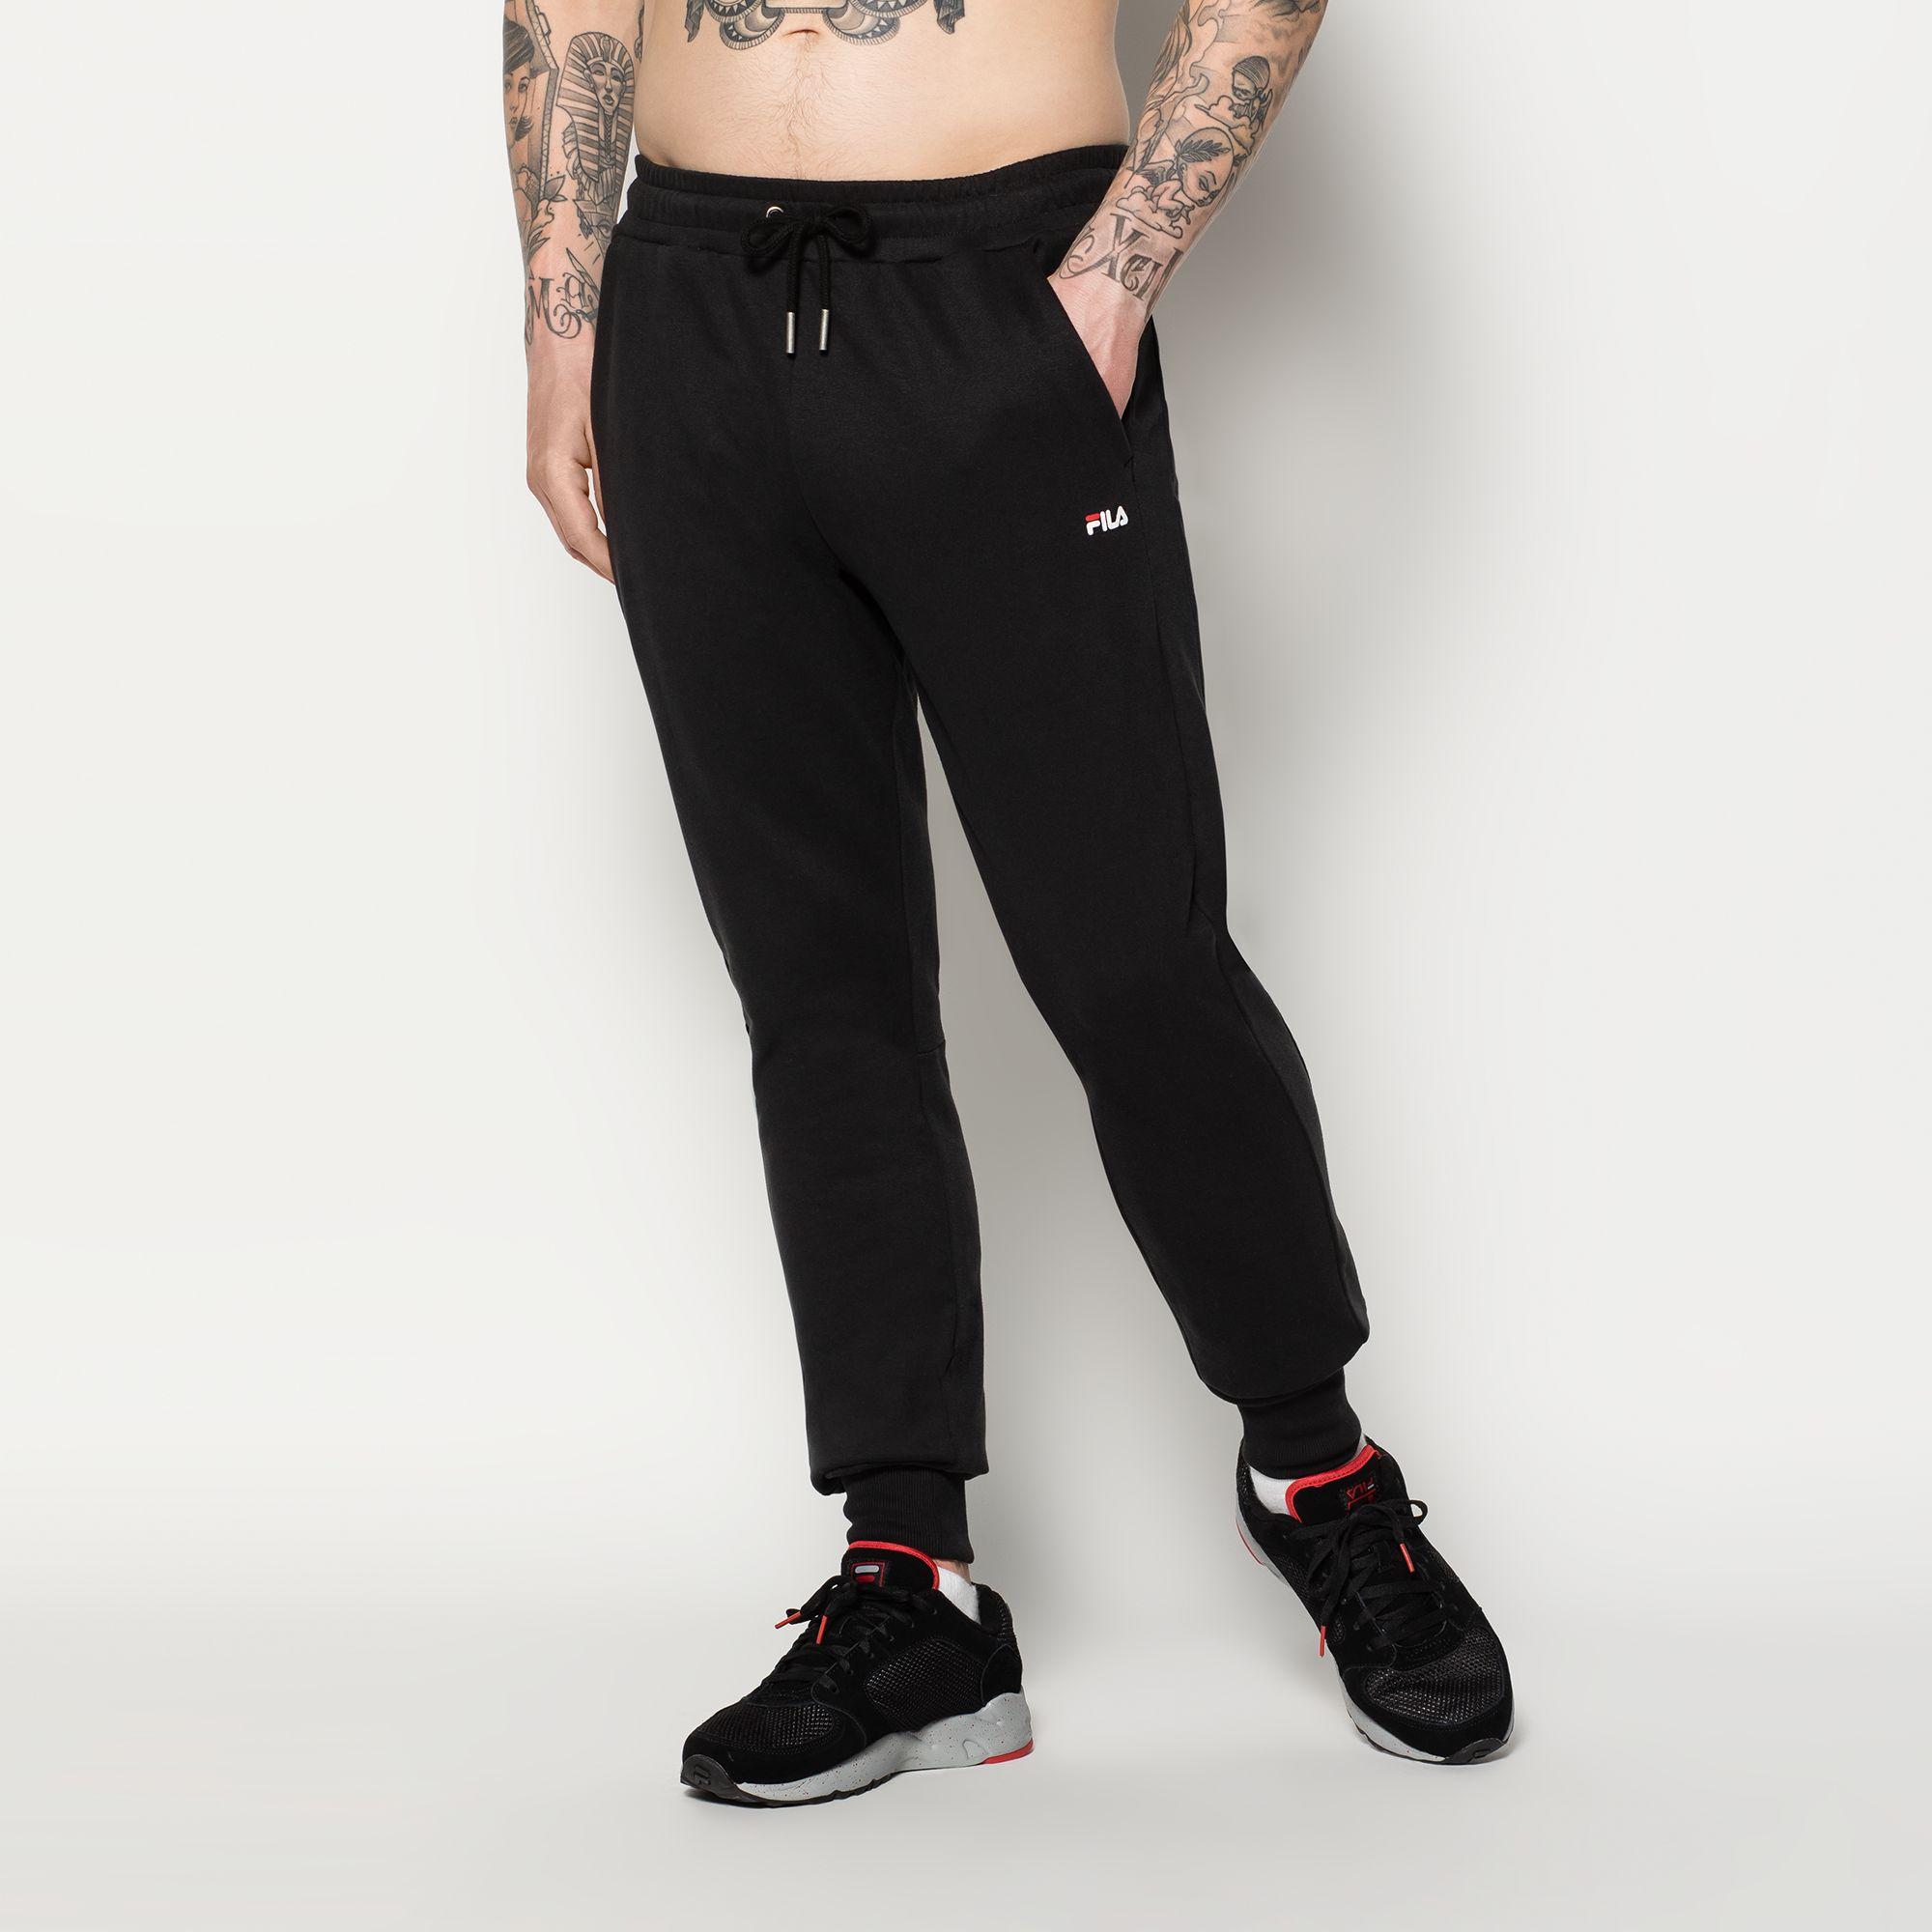 Raiden Slim Pants